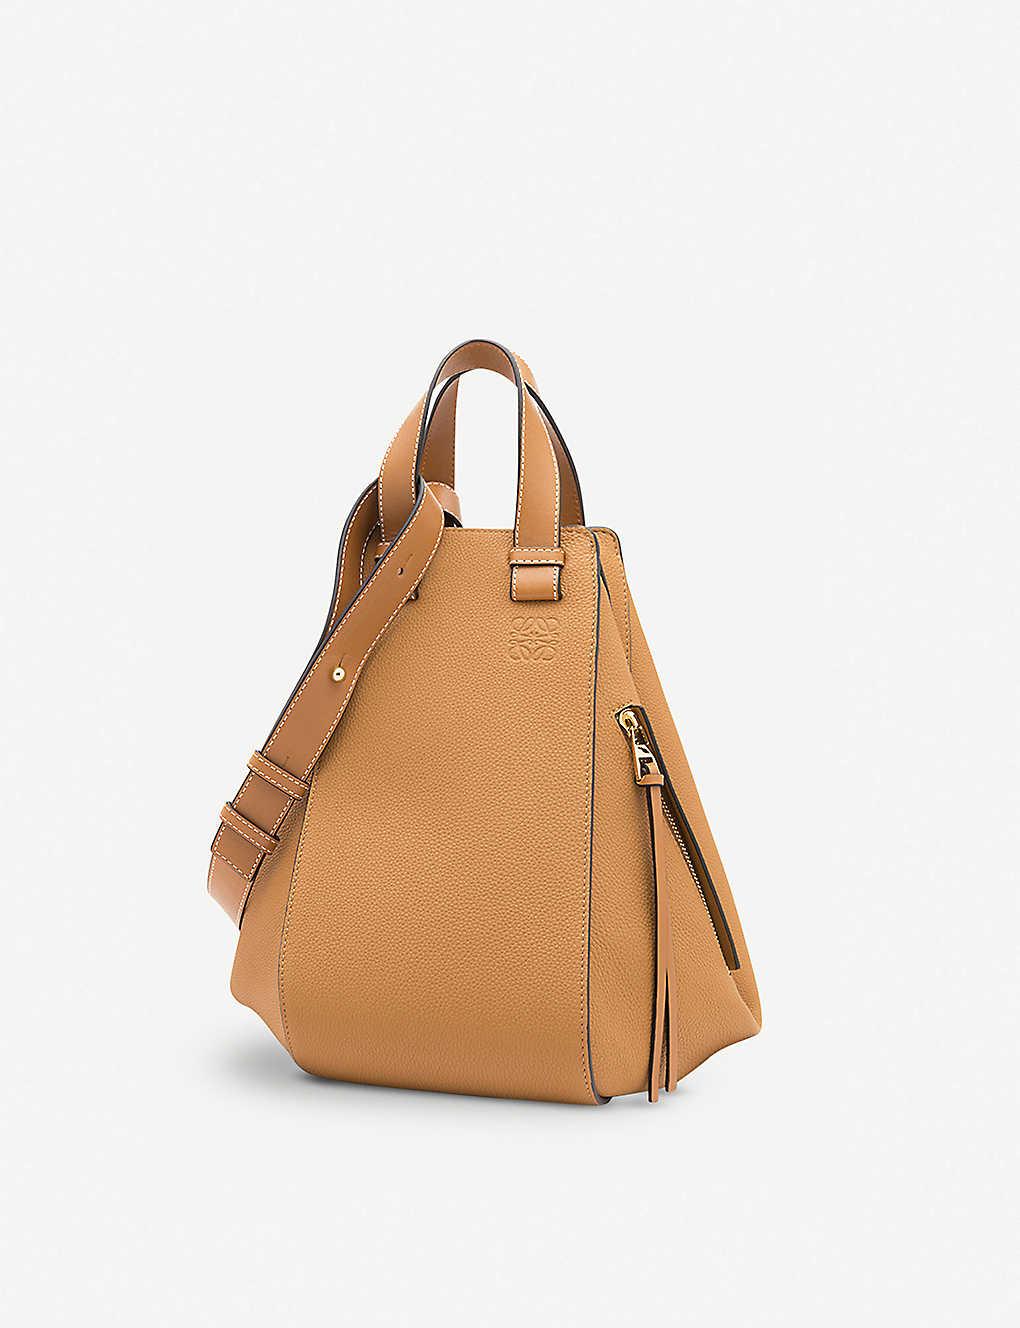 93b979dfe66e LOEWE - Hammock medium leather handbag